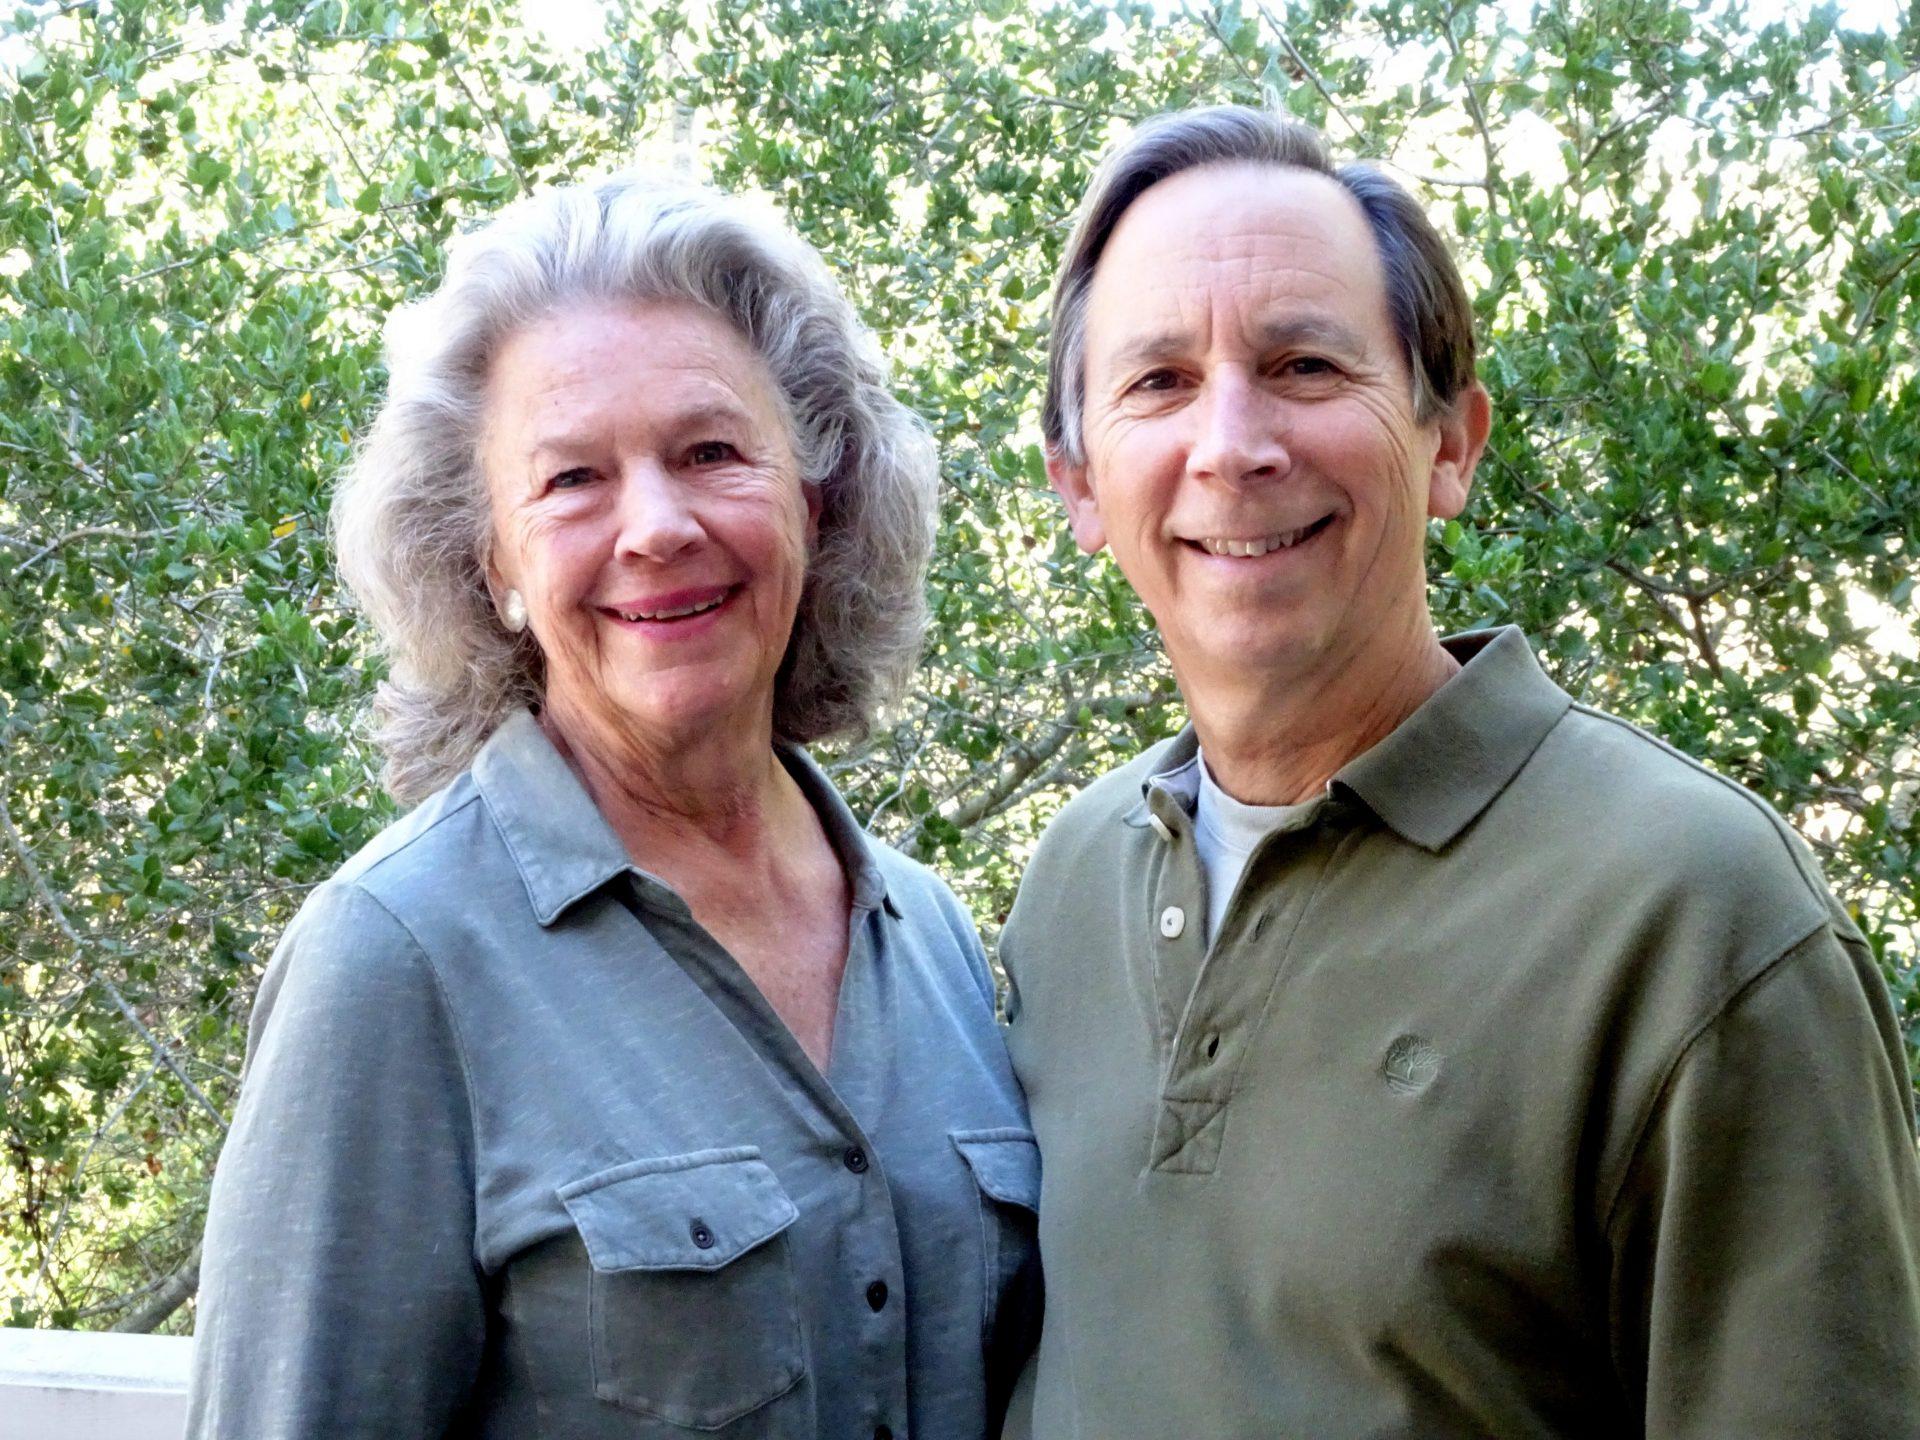 Thank You Bill & Kathy #PeopleWeLove